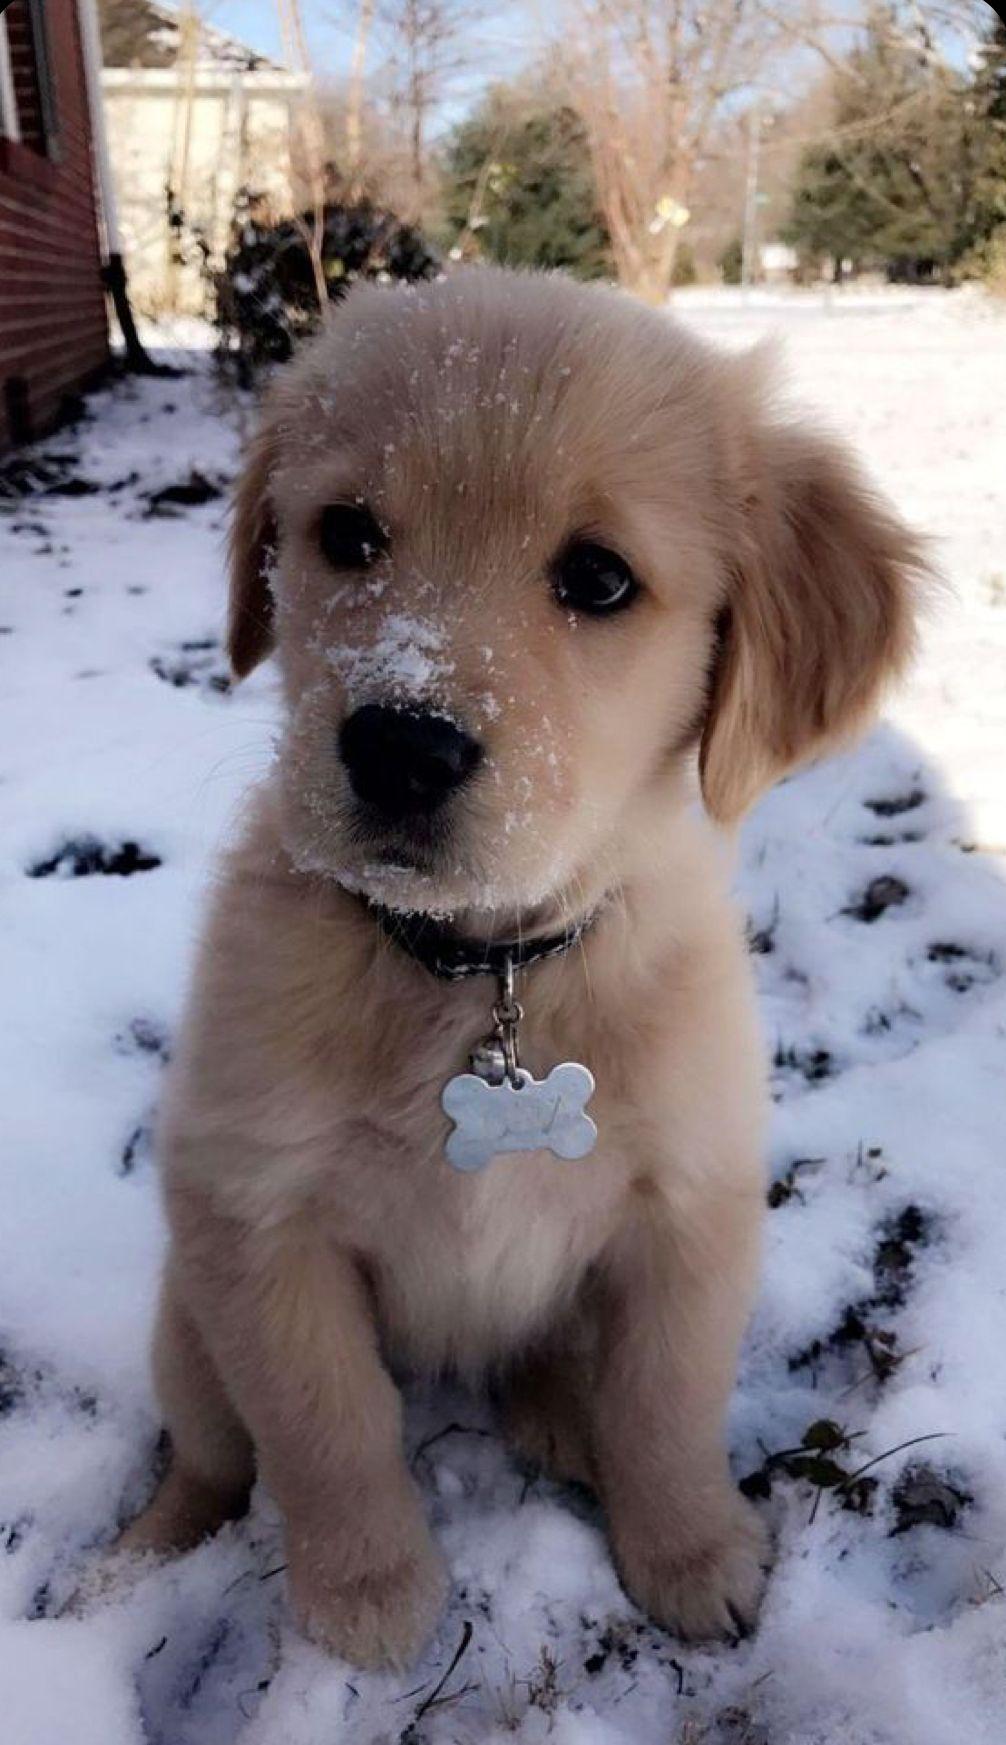 Cute Baby Golden Retriever Puppy In 2020 Super Cute Puppies Cute Dogs Breeds Cute Animals